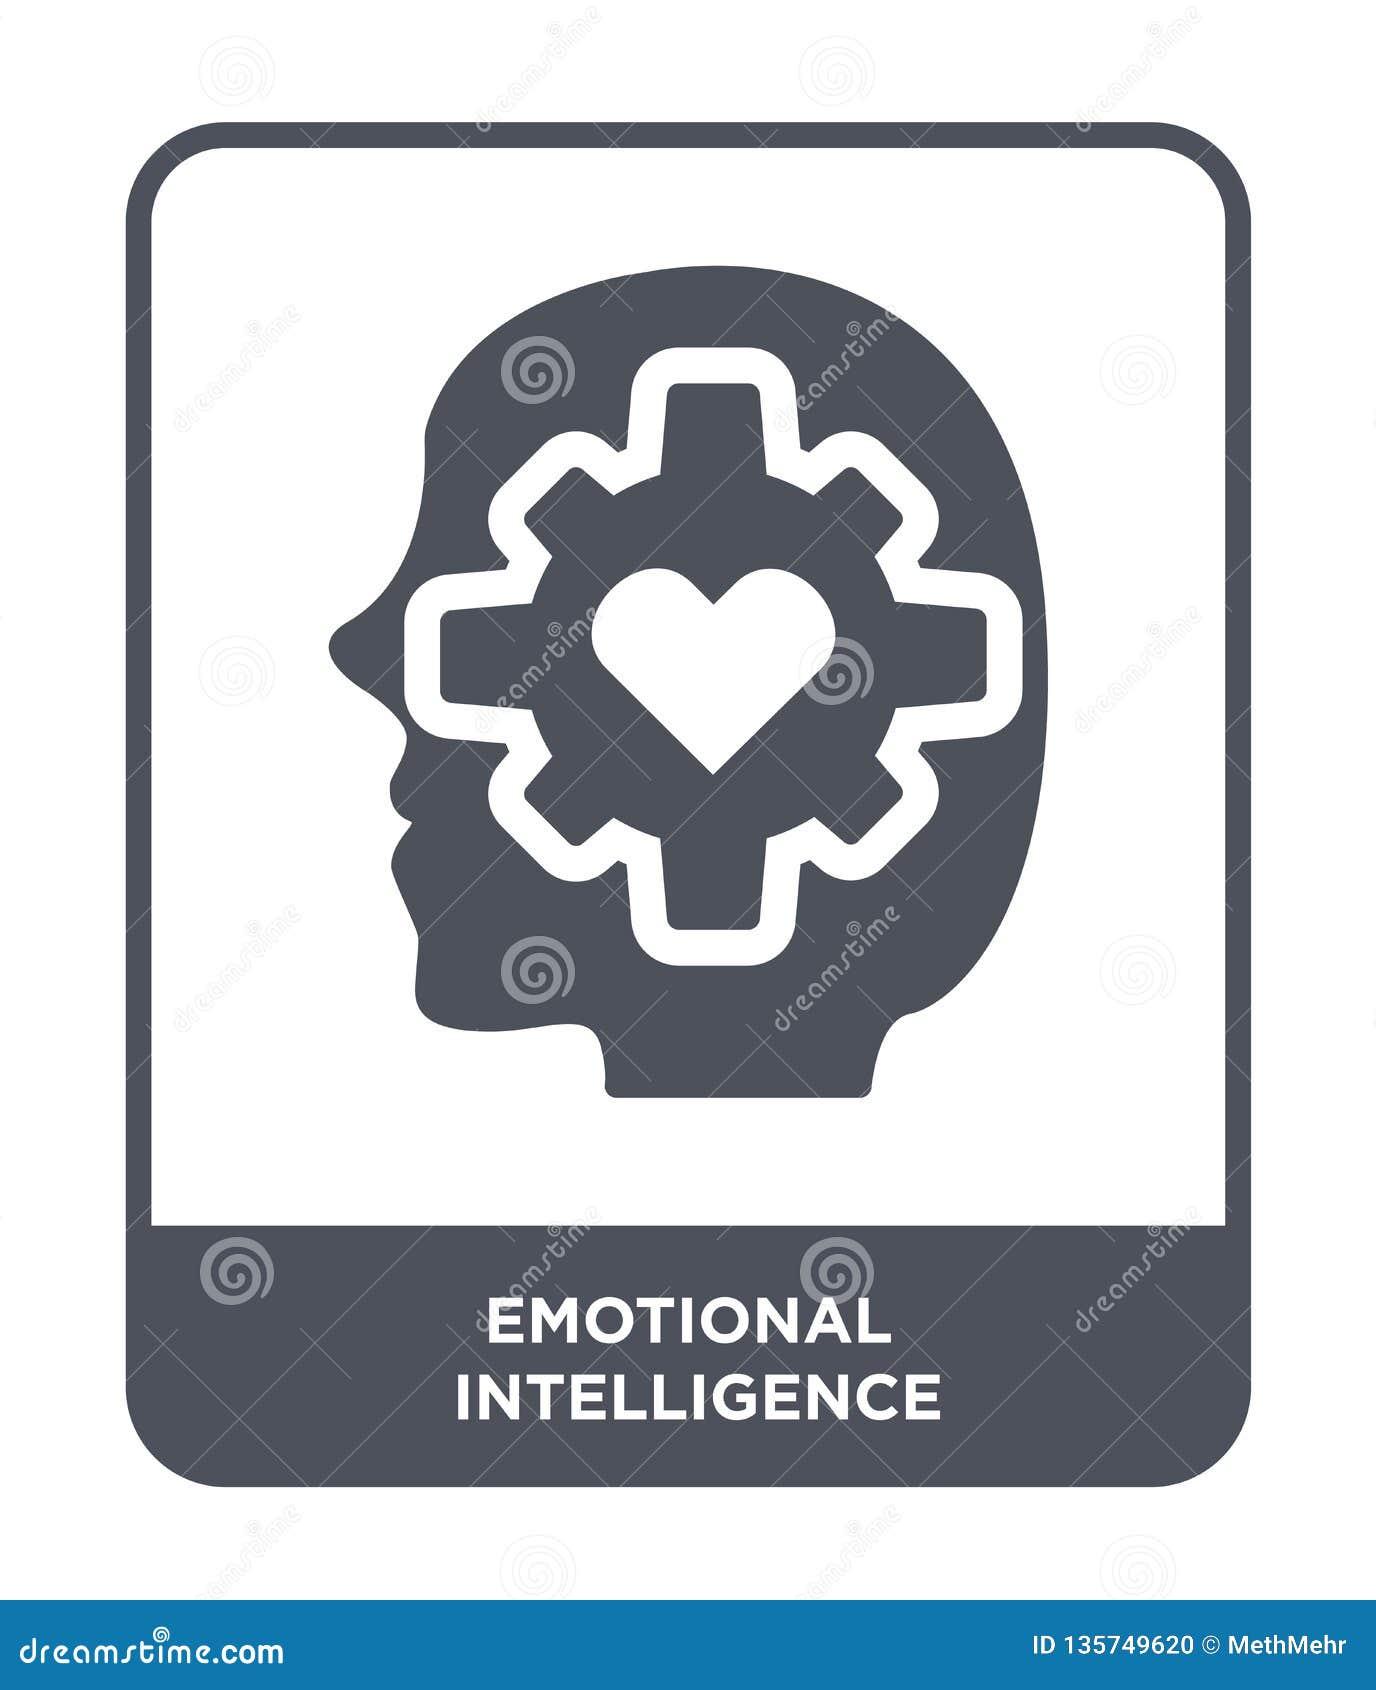 ícone emocional da inteligência no estilo na moda do projeto ícone emocional da inteligência isolado no fundo branco emocional